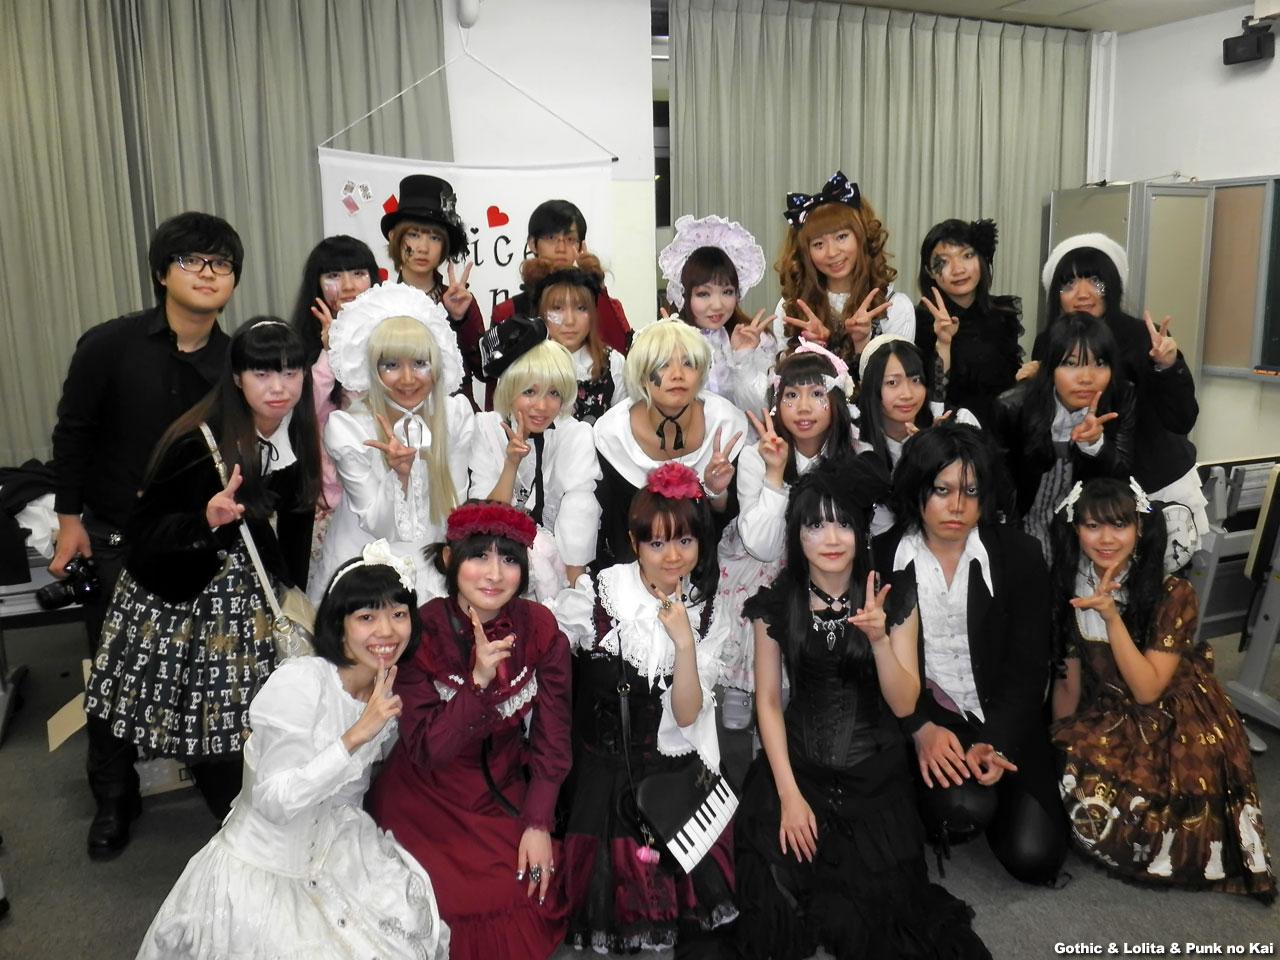 Lolita, Gothic, & Punk Fashion Show & Talk Event in Tokyo – March 4